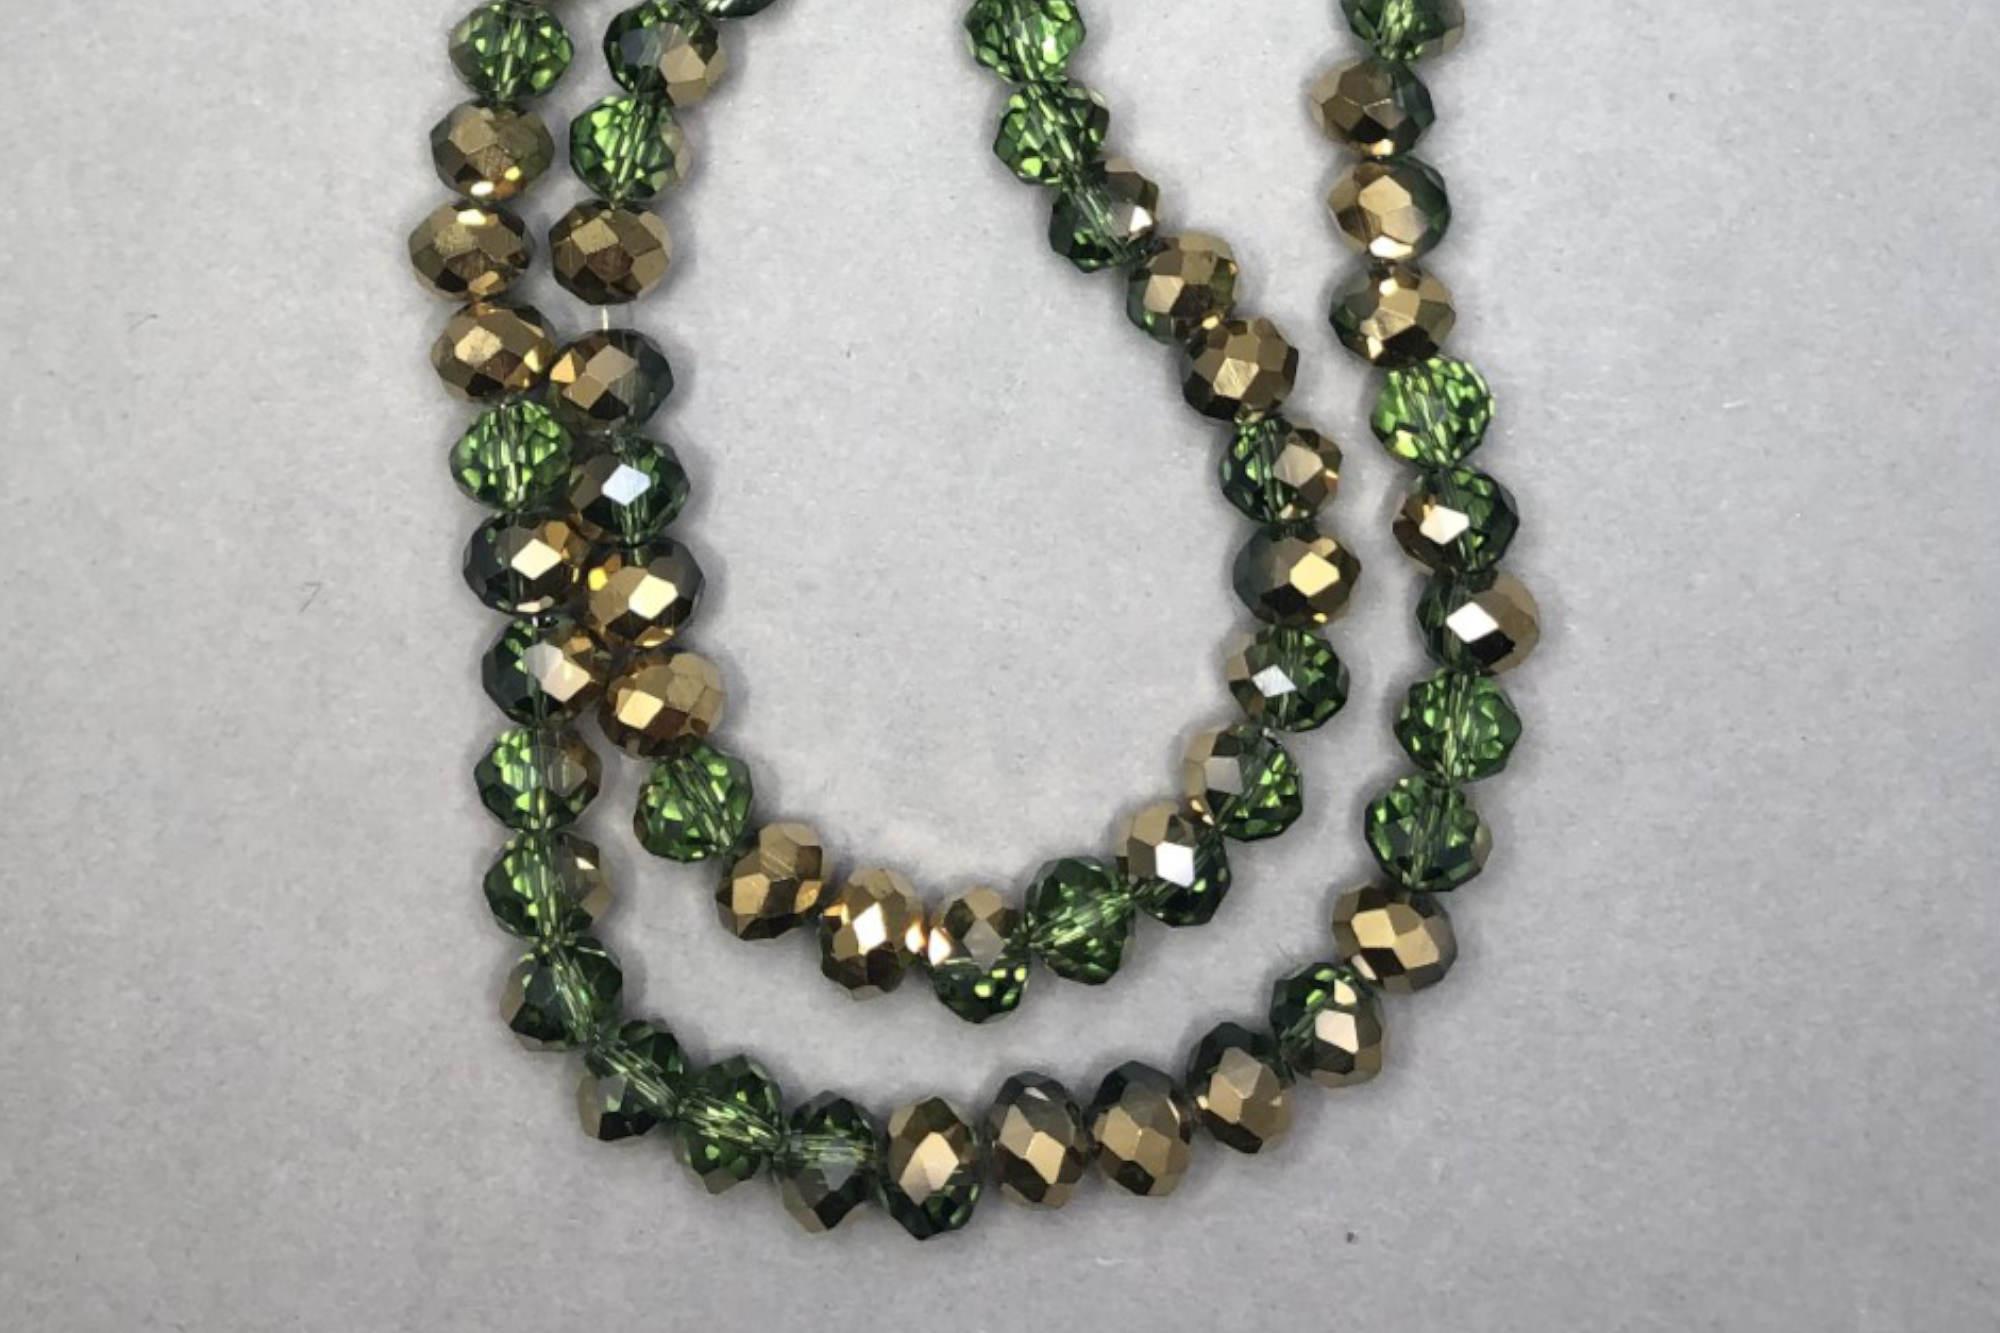 Half Green/Bronze Faceted Glass Beads